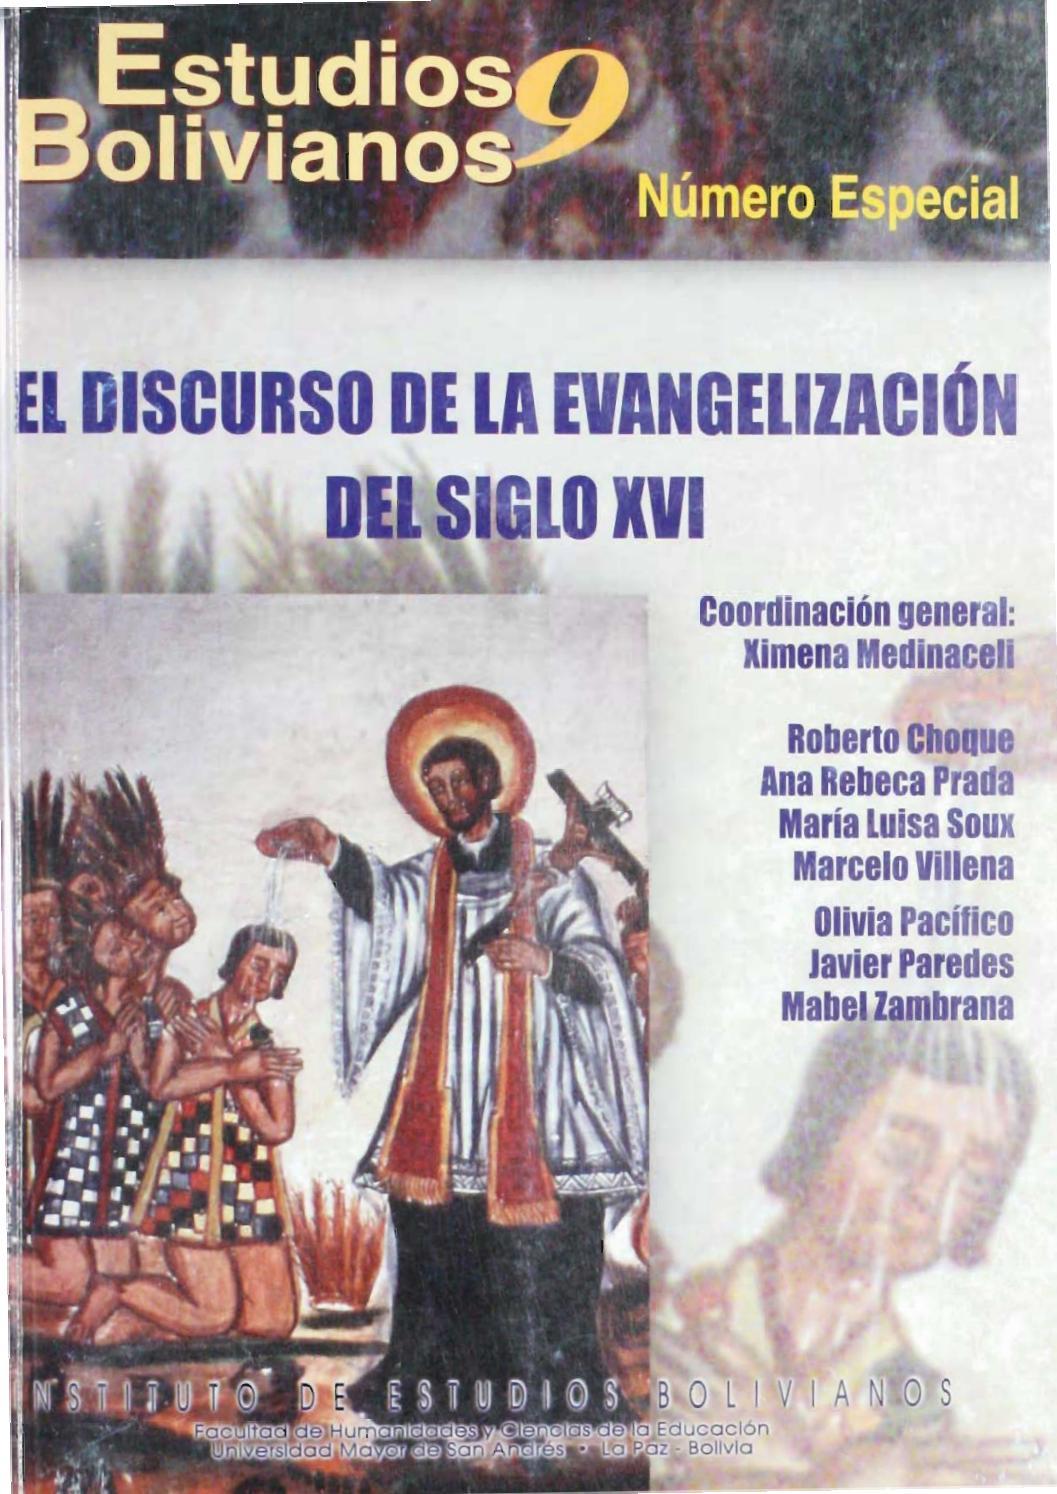 Estudios Bolivianos 009 by Postgrado Humanidades UMSA - issuu